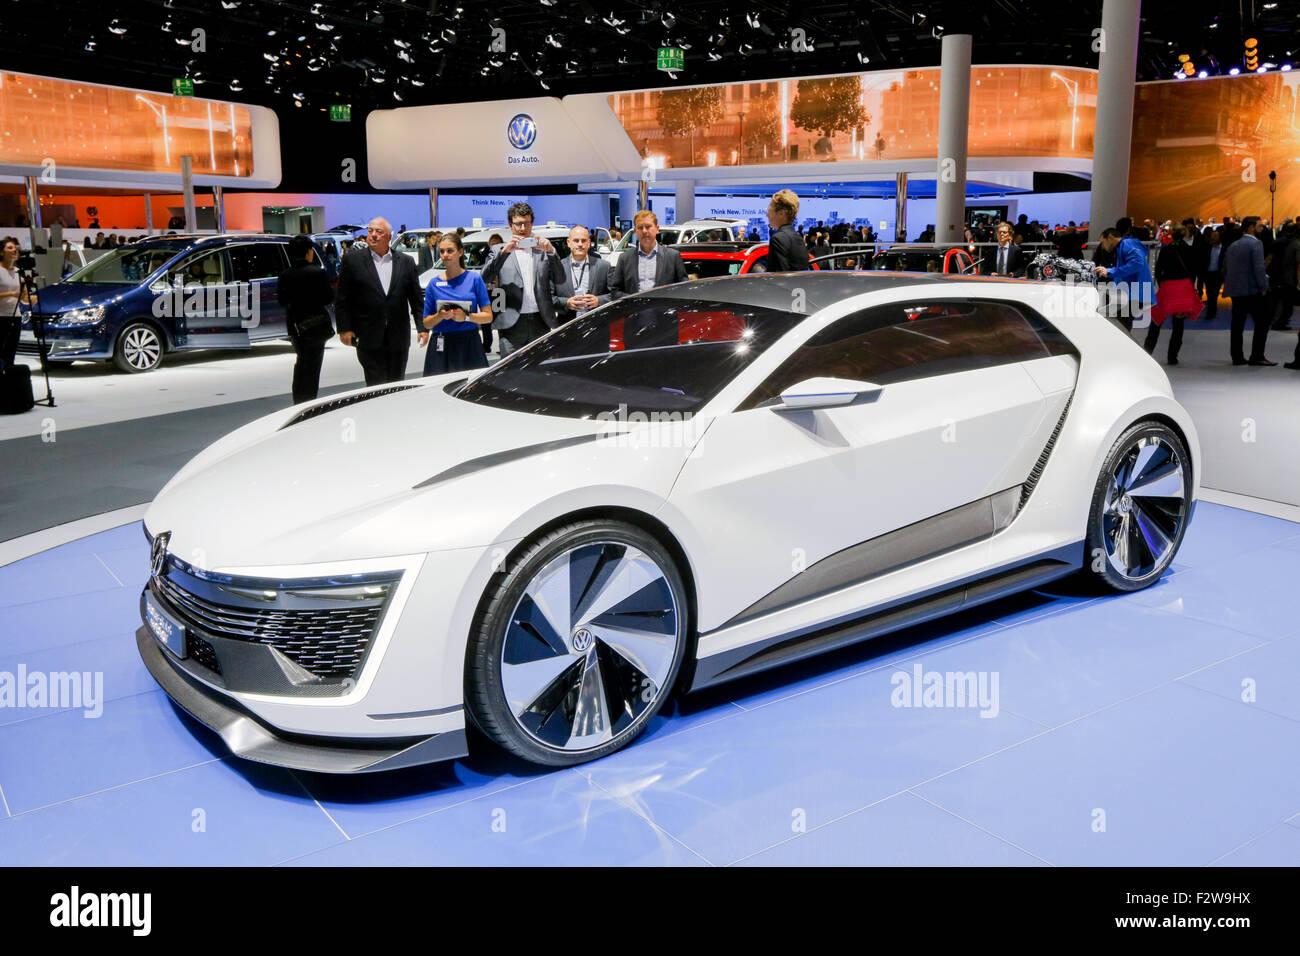 Frankfurt/M, 15.09.2015 - New VW Volkswagen GOLF GTE SPORT concept  car at the 66th International Motor Show IAA - Stock Image